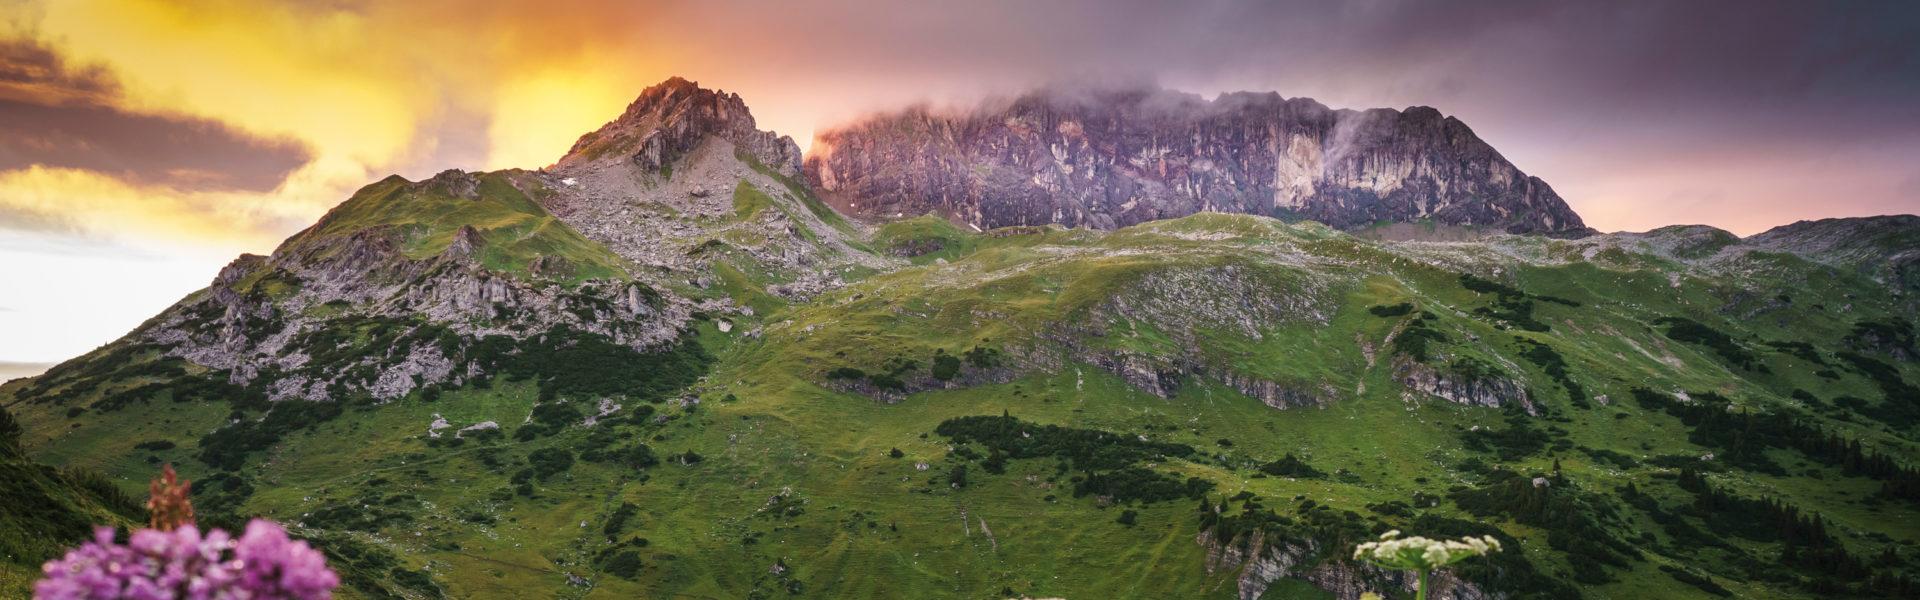 Formarinsee Rote Wand, Arlberg, Urlaub in Vorarlberg (c) Dietmar-Denger / Vorarlberg Tourismus